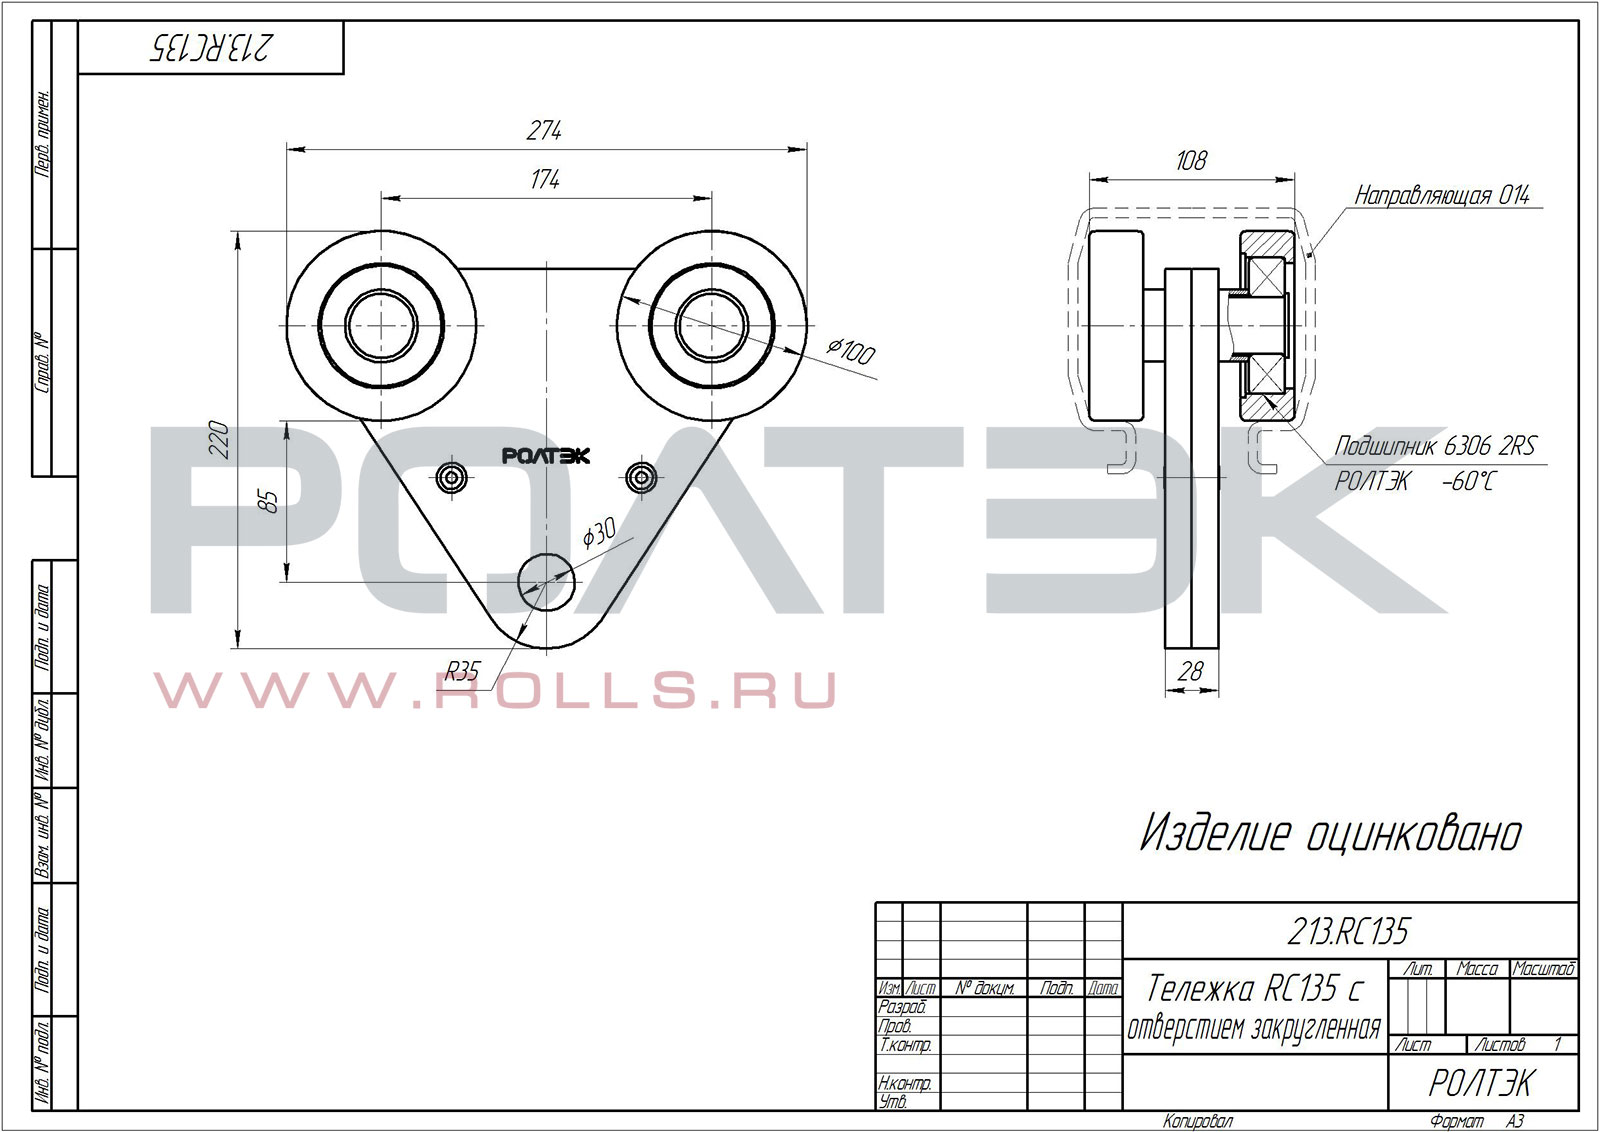 Тележка RC135 с отверстием закругленная